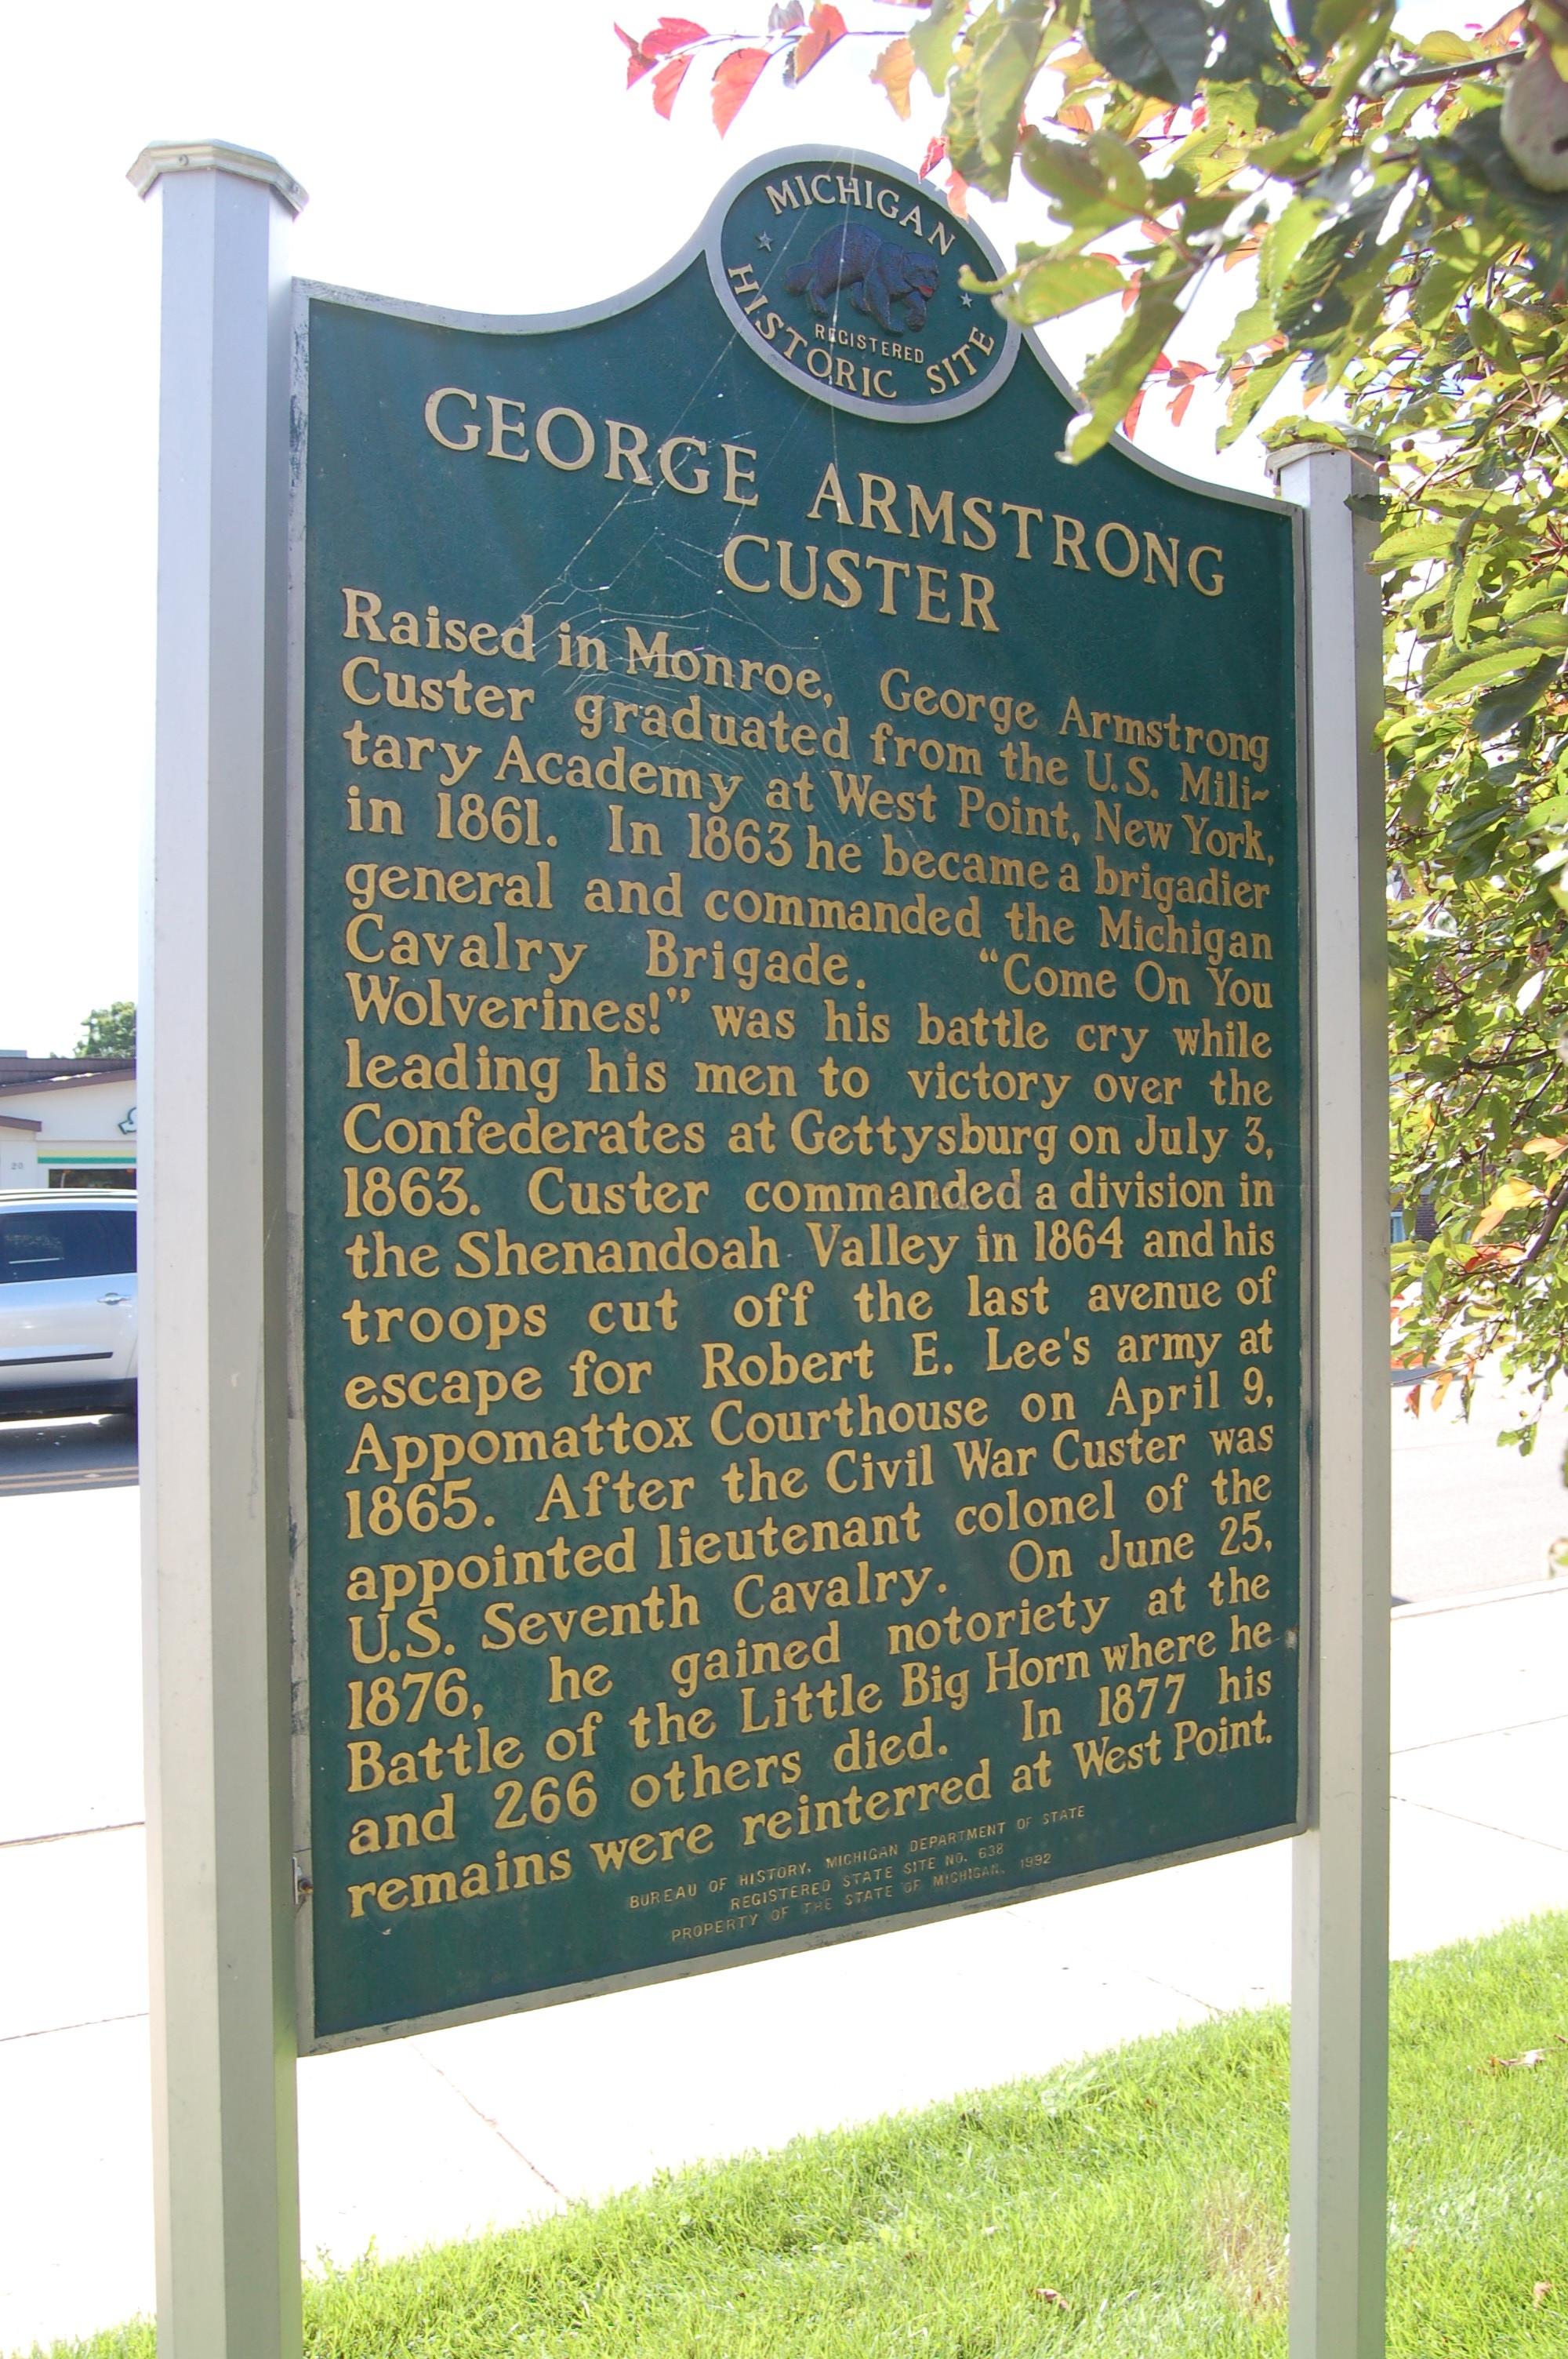 Michigan Roadside Attractions: George Custer Statue in